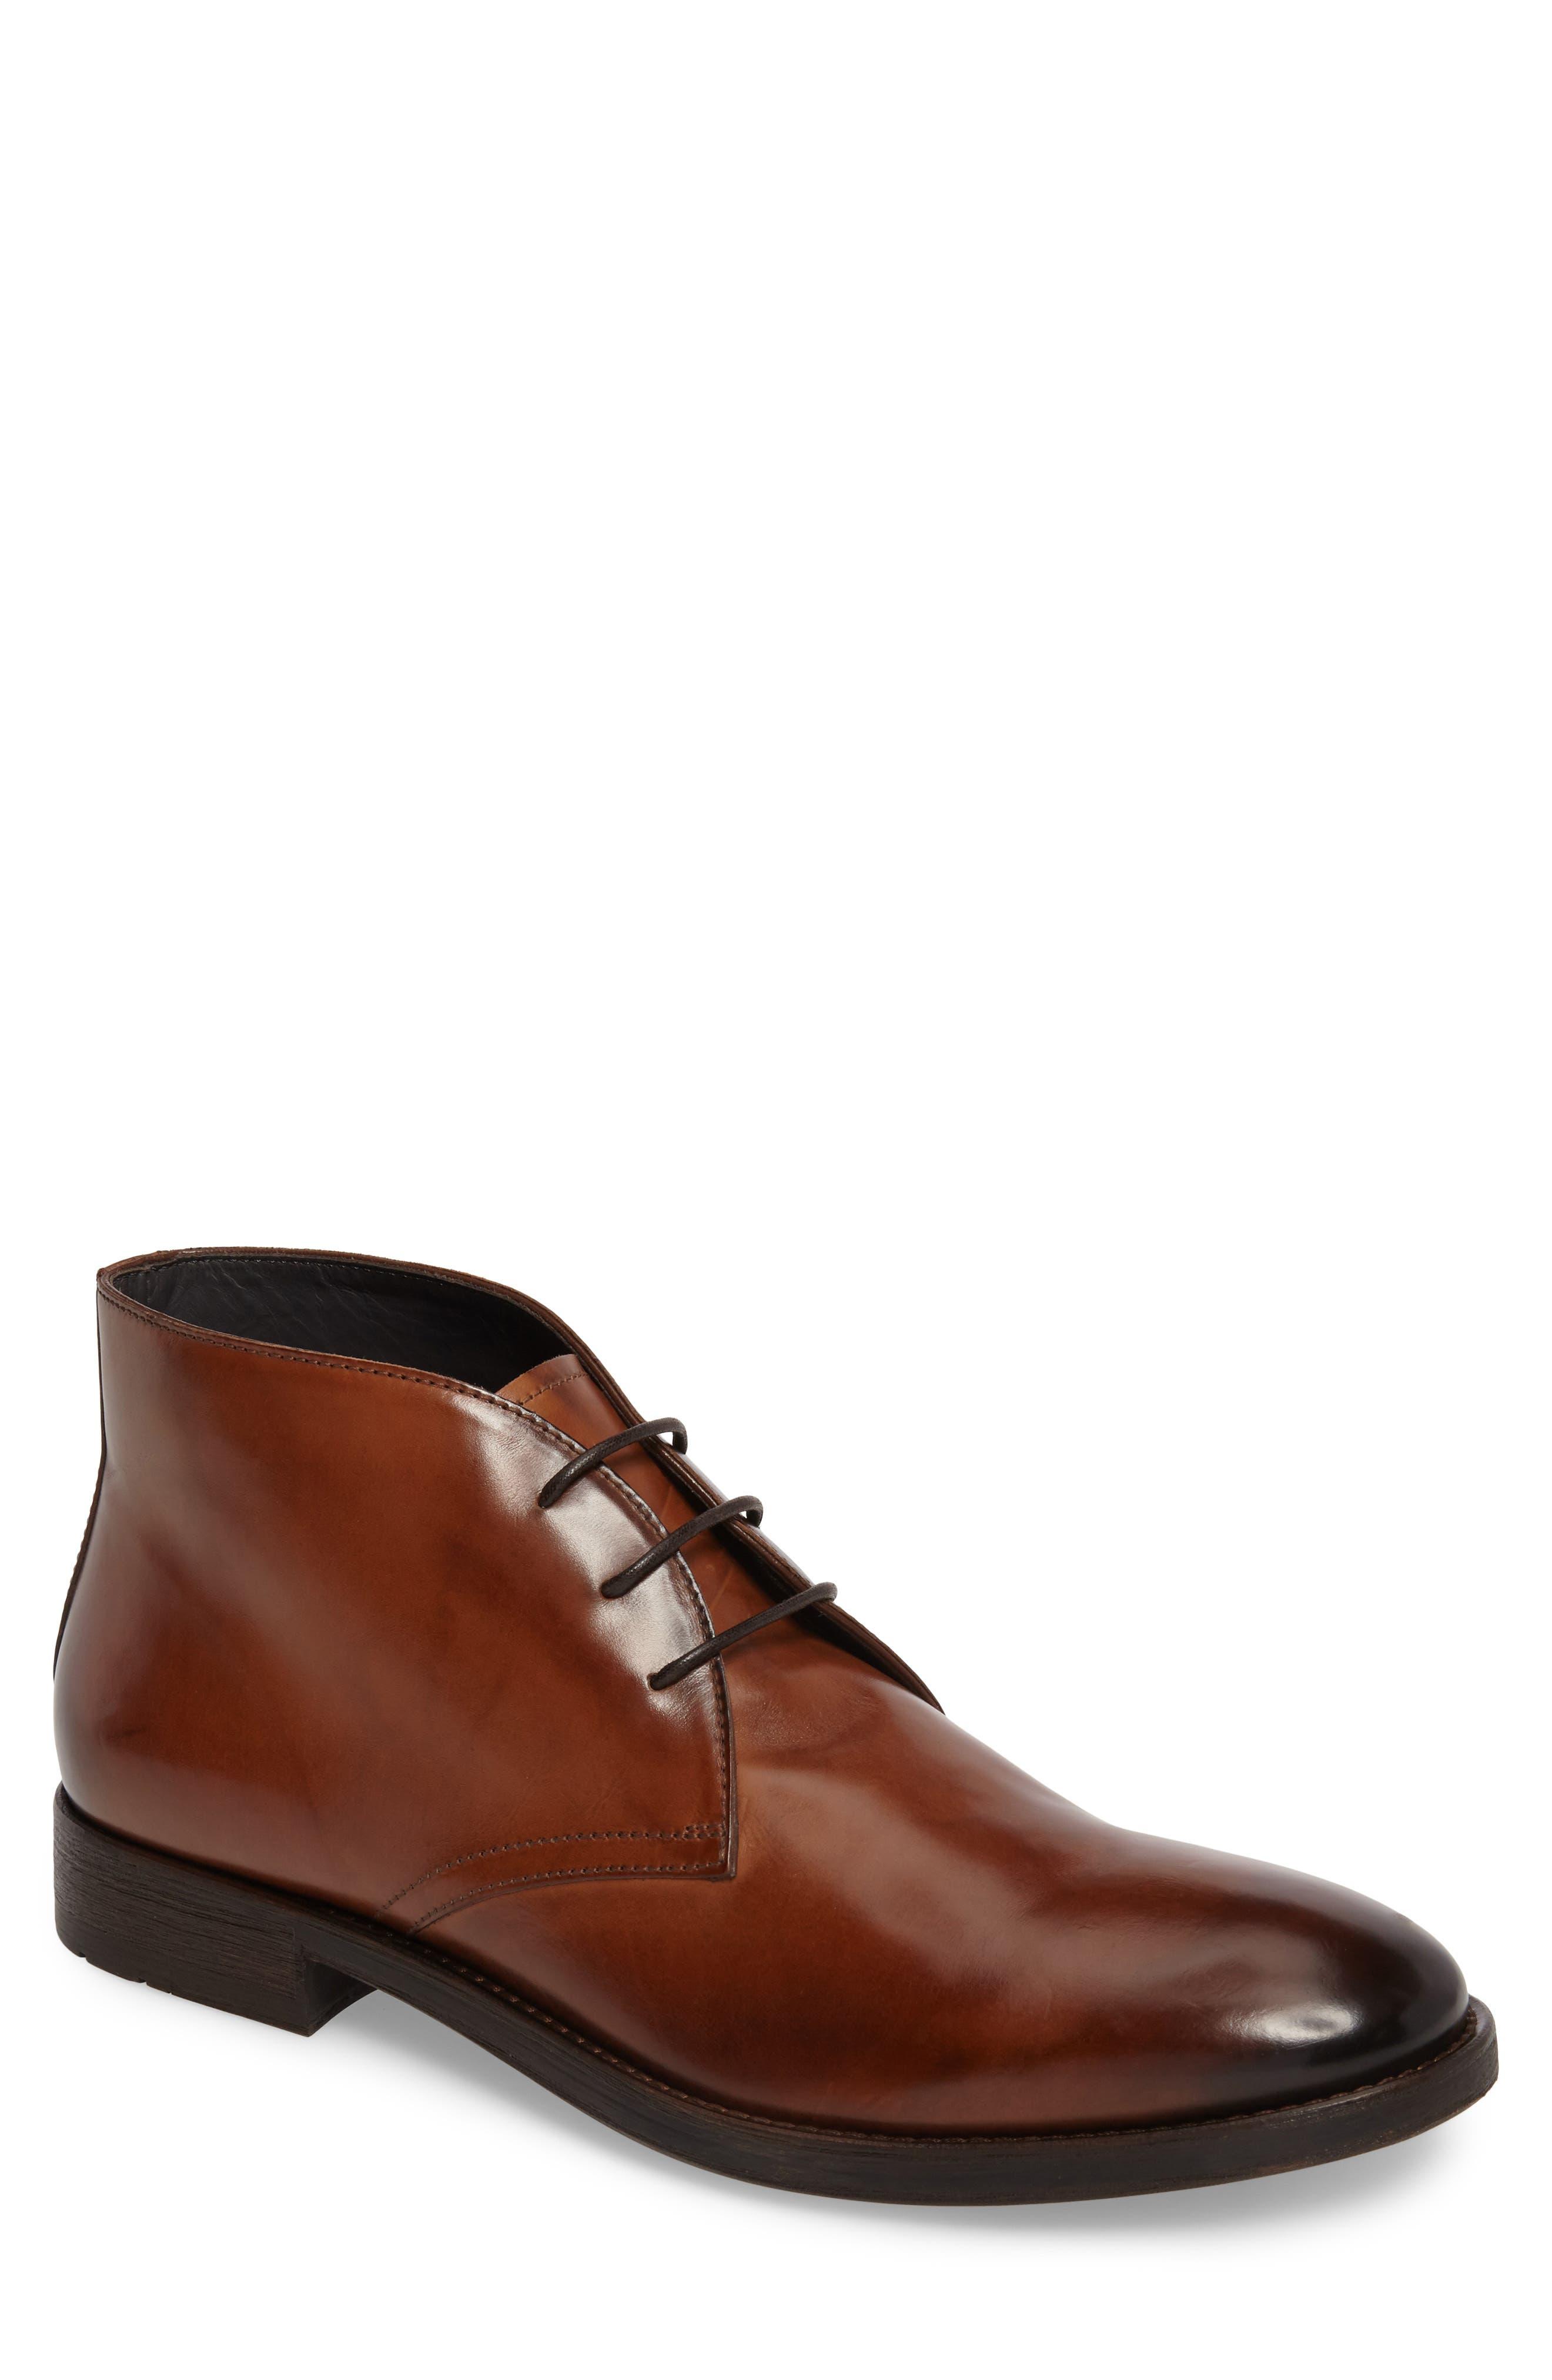 Connor Chukka Boot,                         Main,                         color,